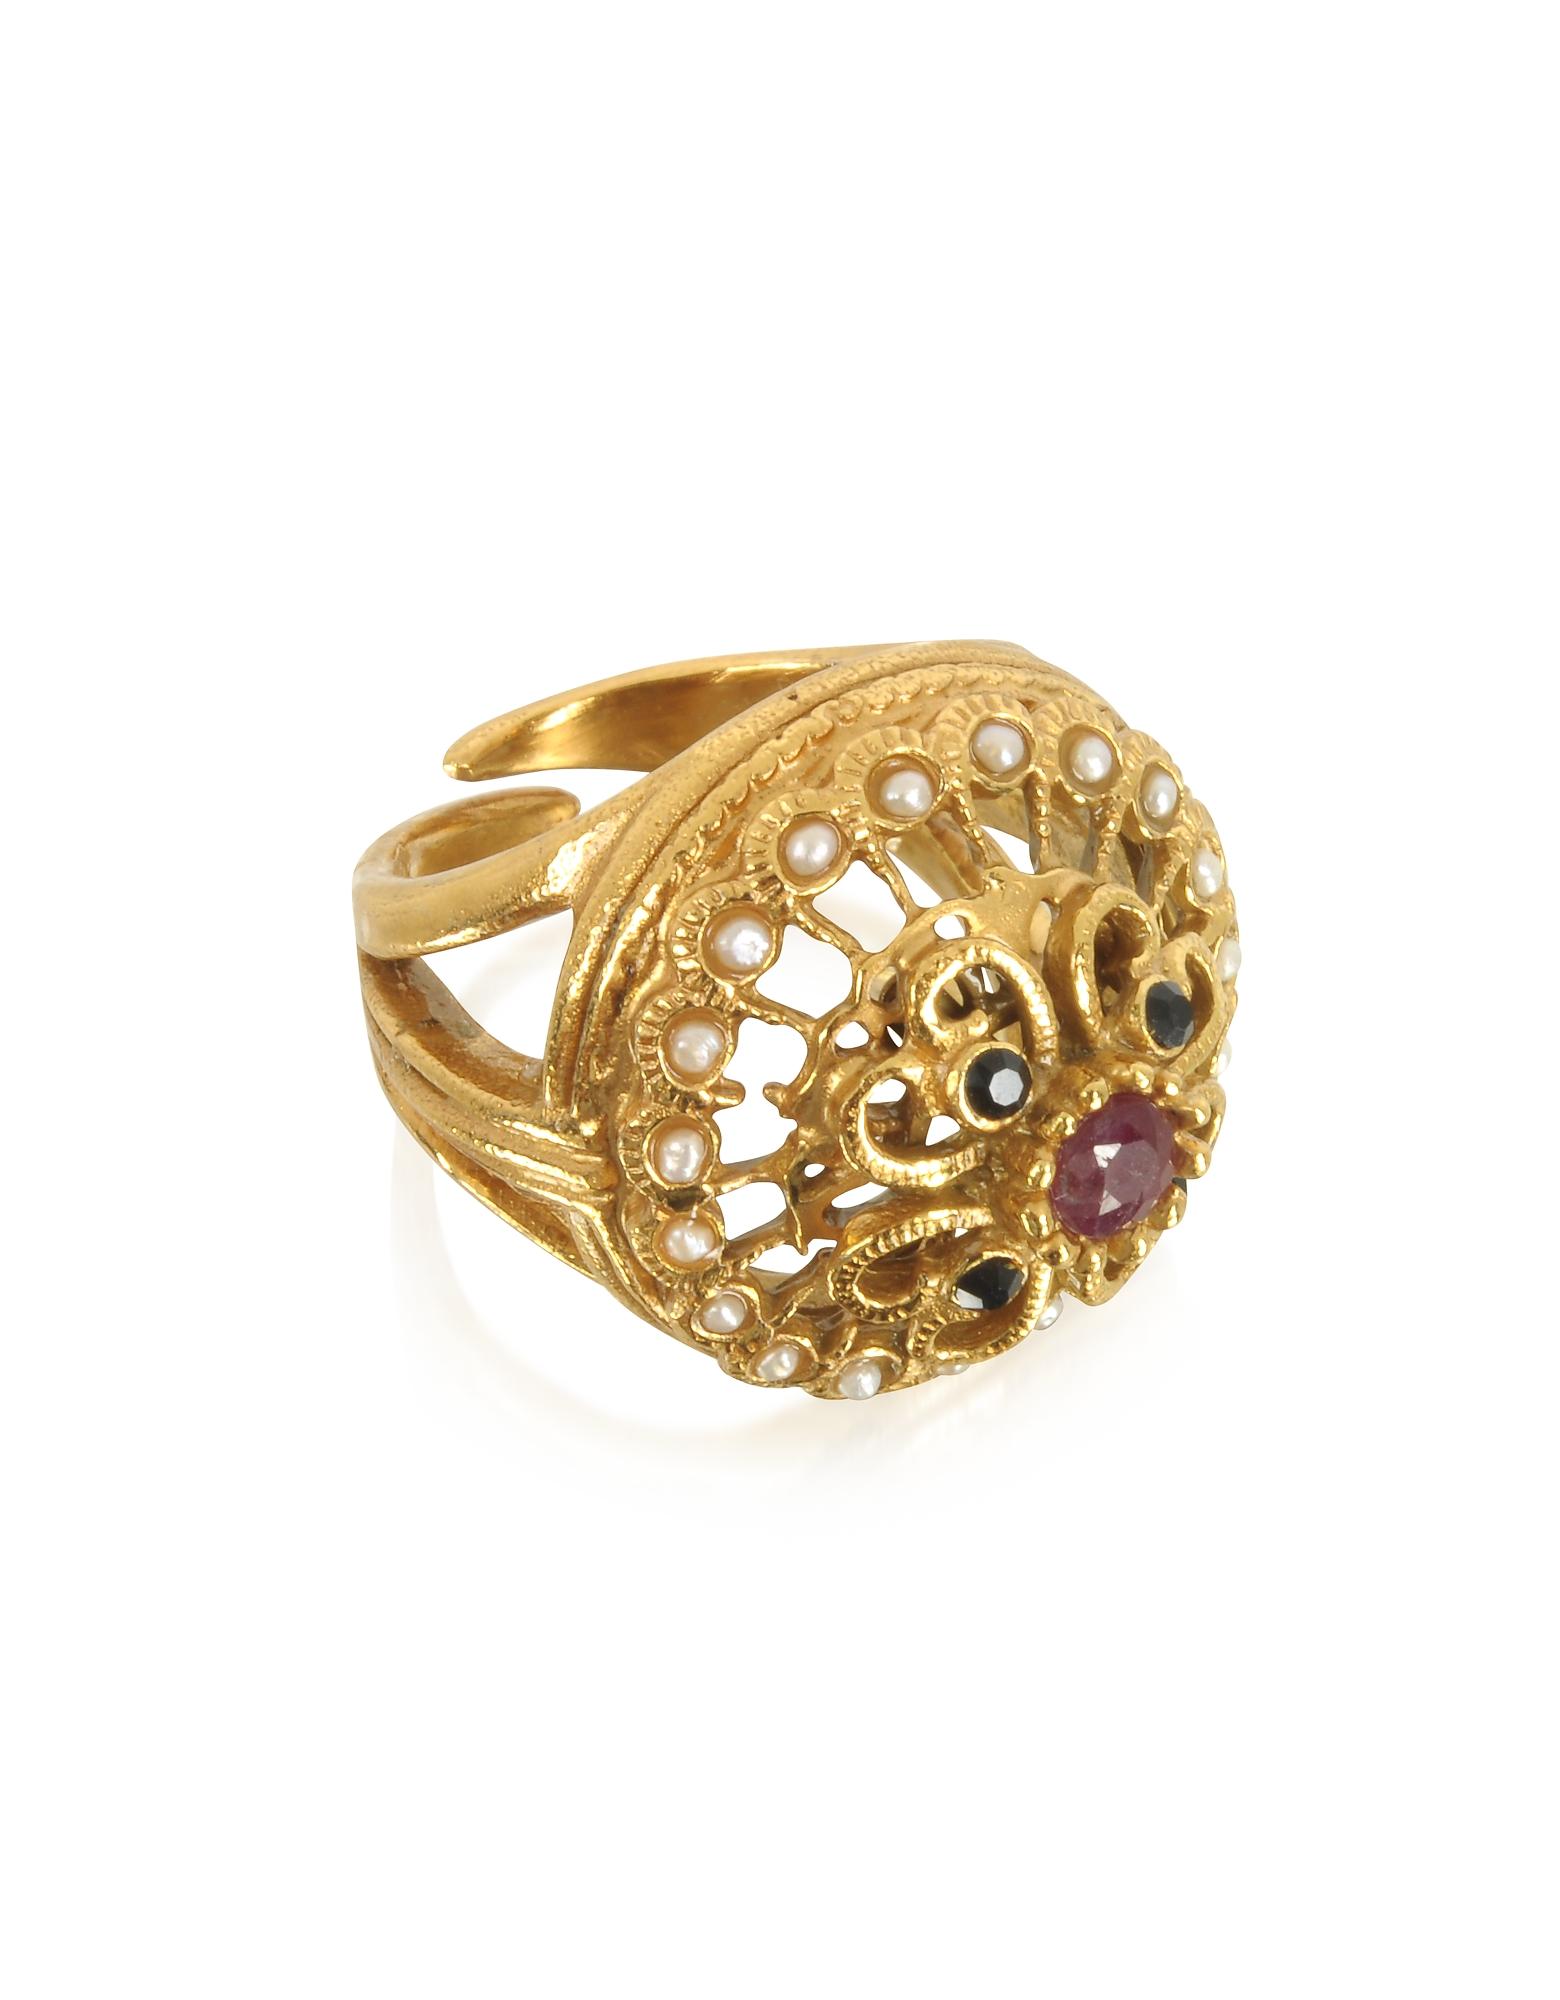 Alcozer & J Rings, Mandala Ring w/Stones & Pearls